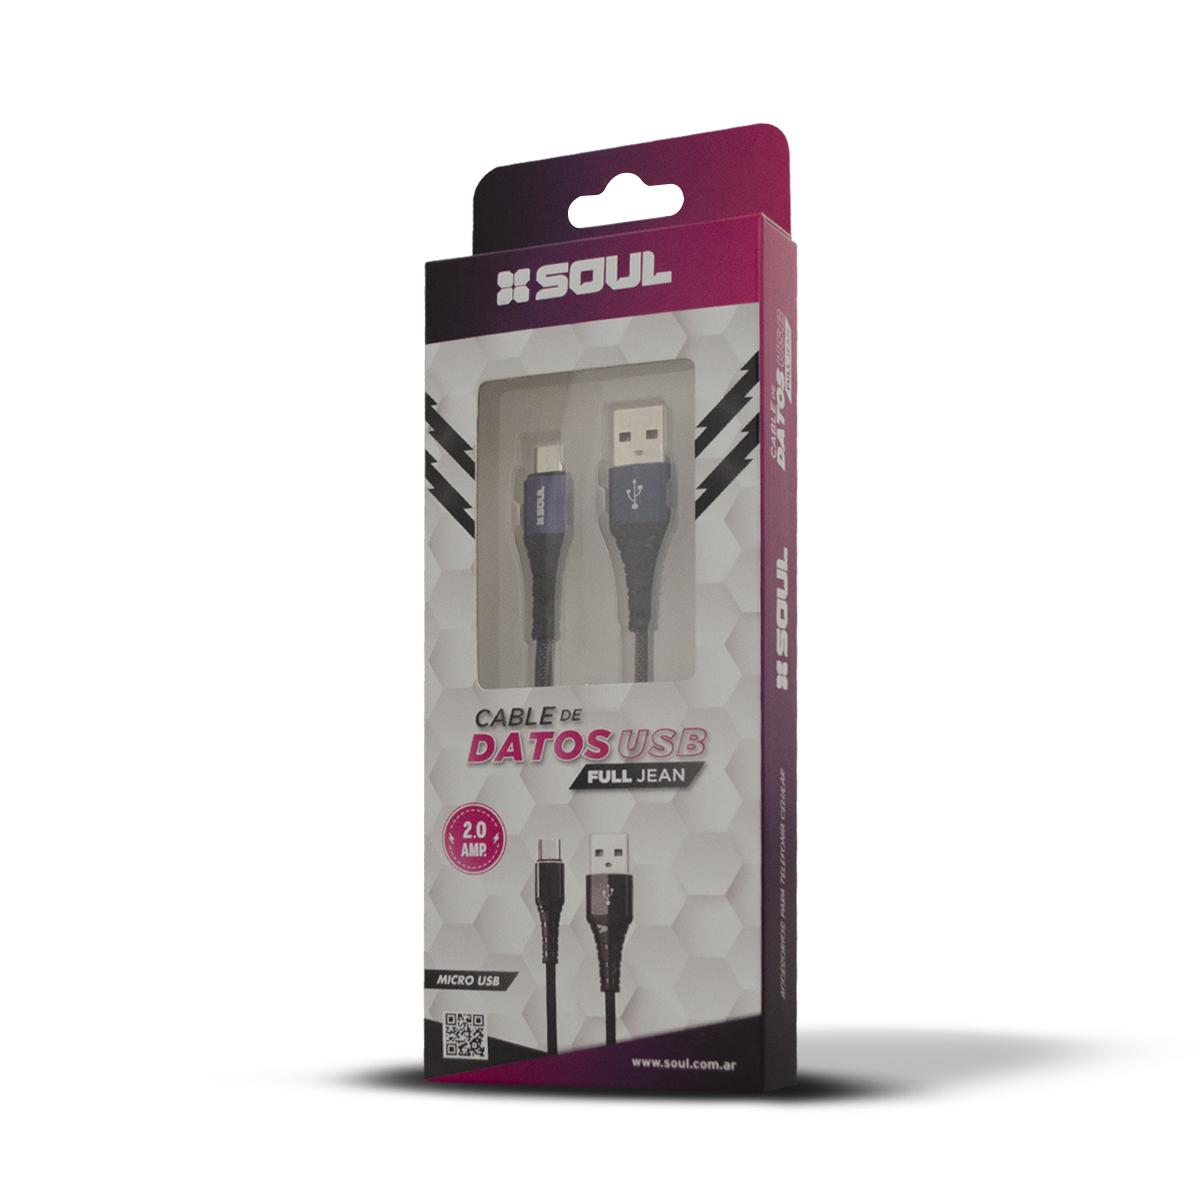 Cable de datos USB Full Jean